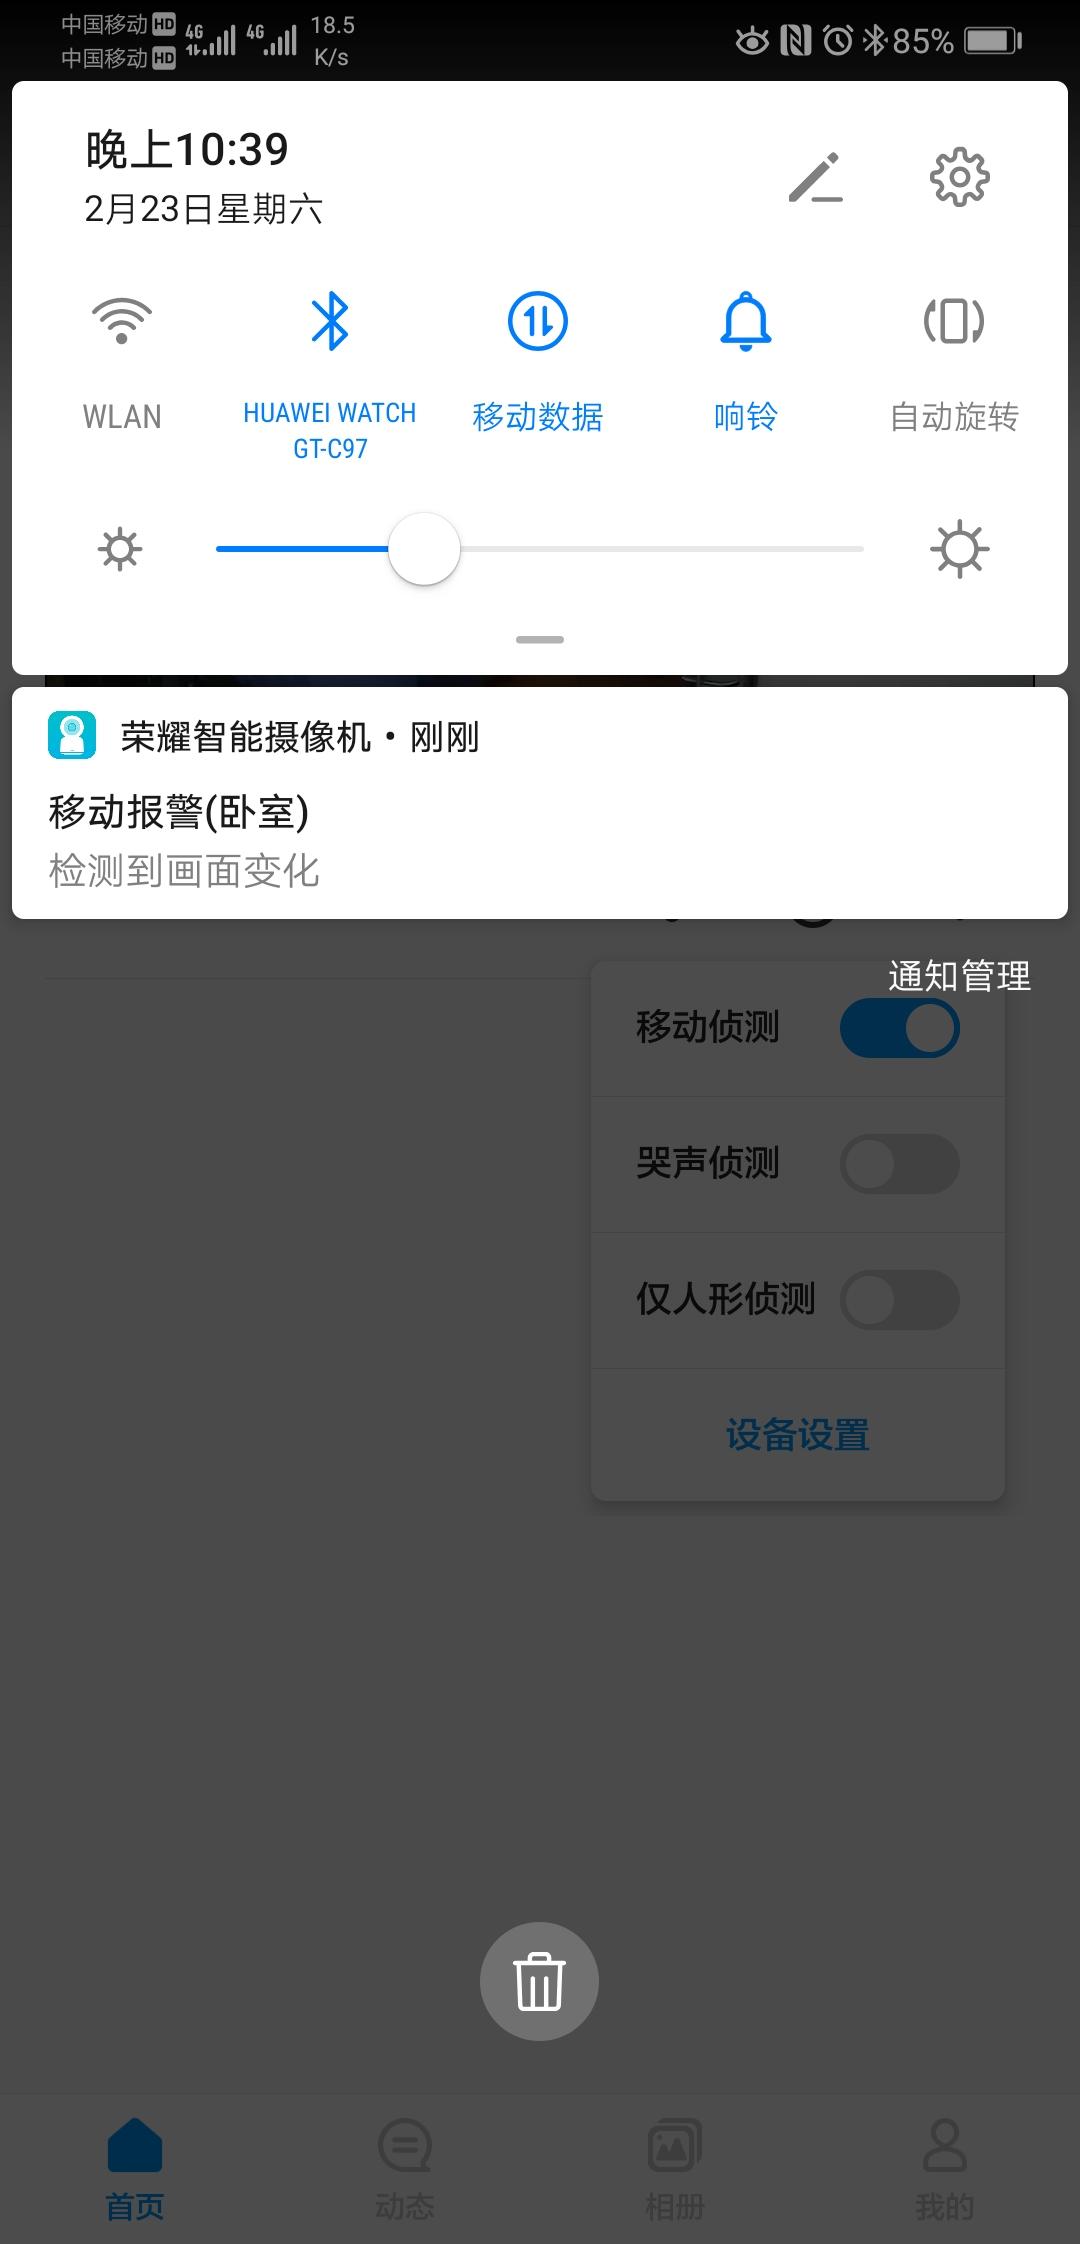 Screenshot_20190223_223902_com.huawei.ipc_honor.jpg